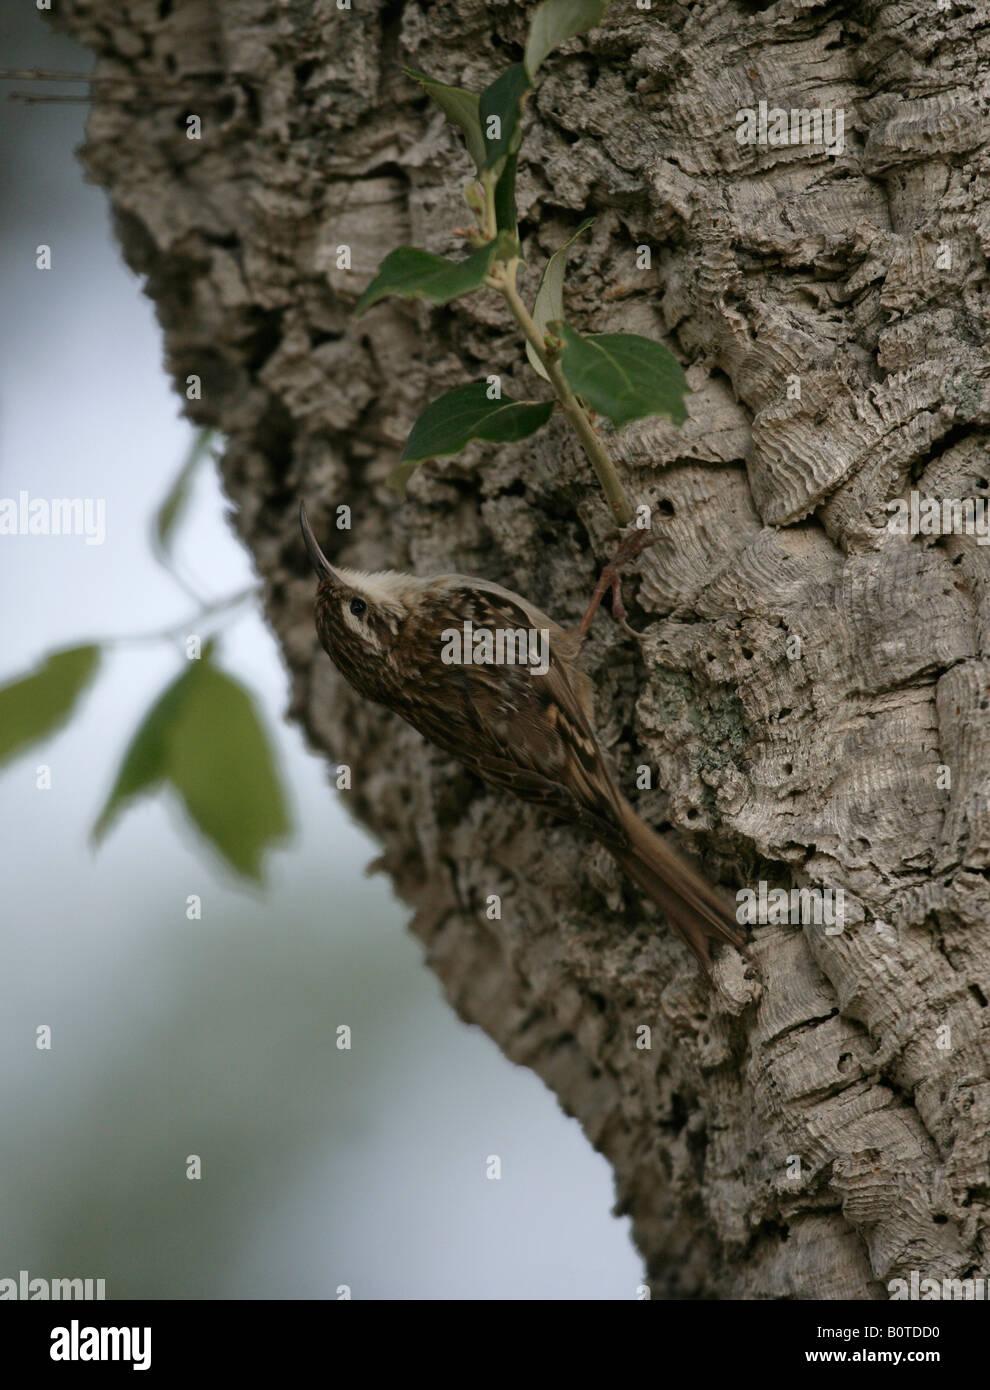 Short toed treecreeper Certhia brachydactyla spring Spain - Stock Image